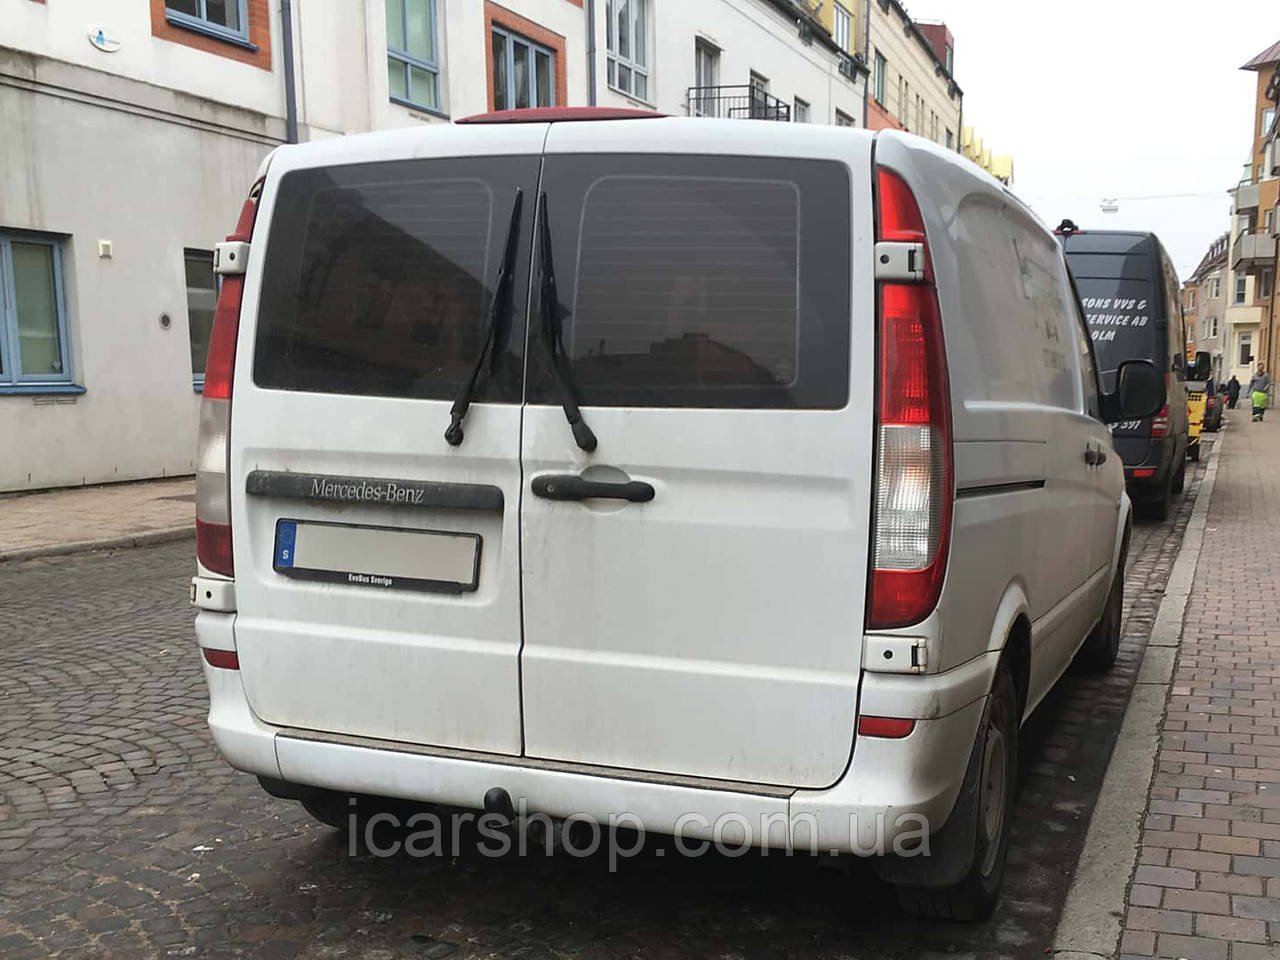 Скло Mercedes Vito II W639 (Viano) 03 - тил правий без електро обігрівача SG